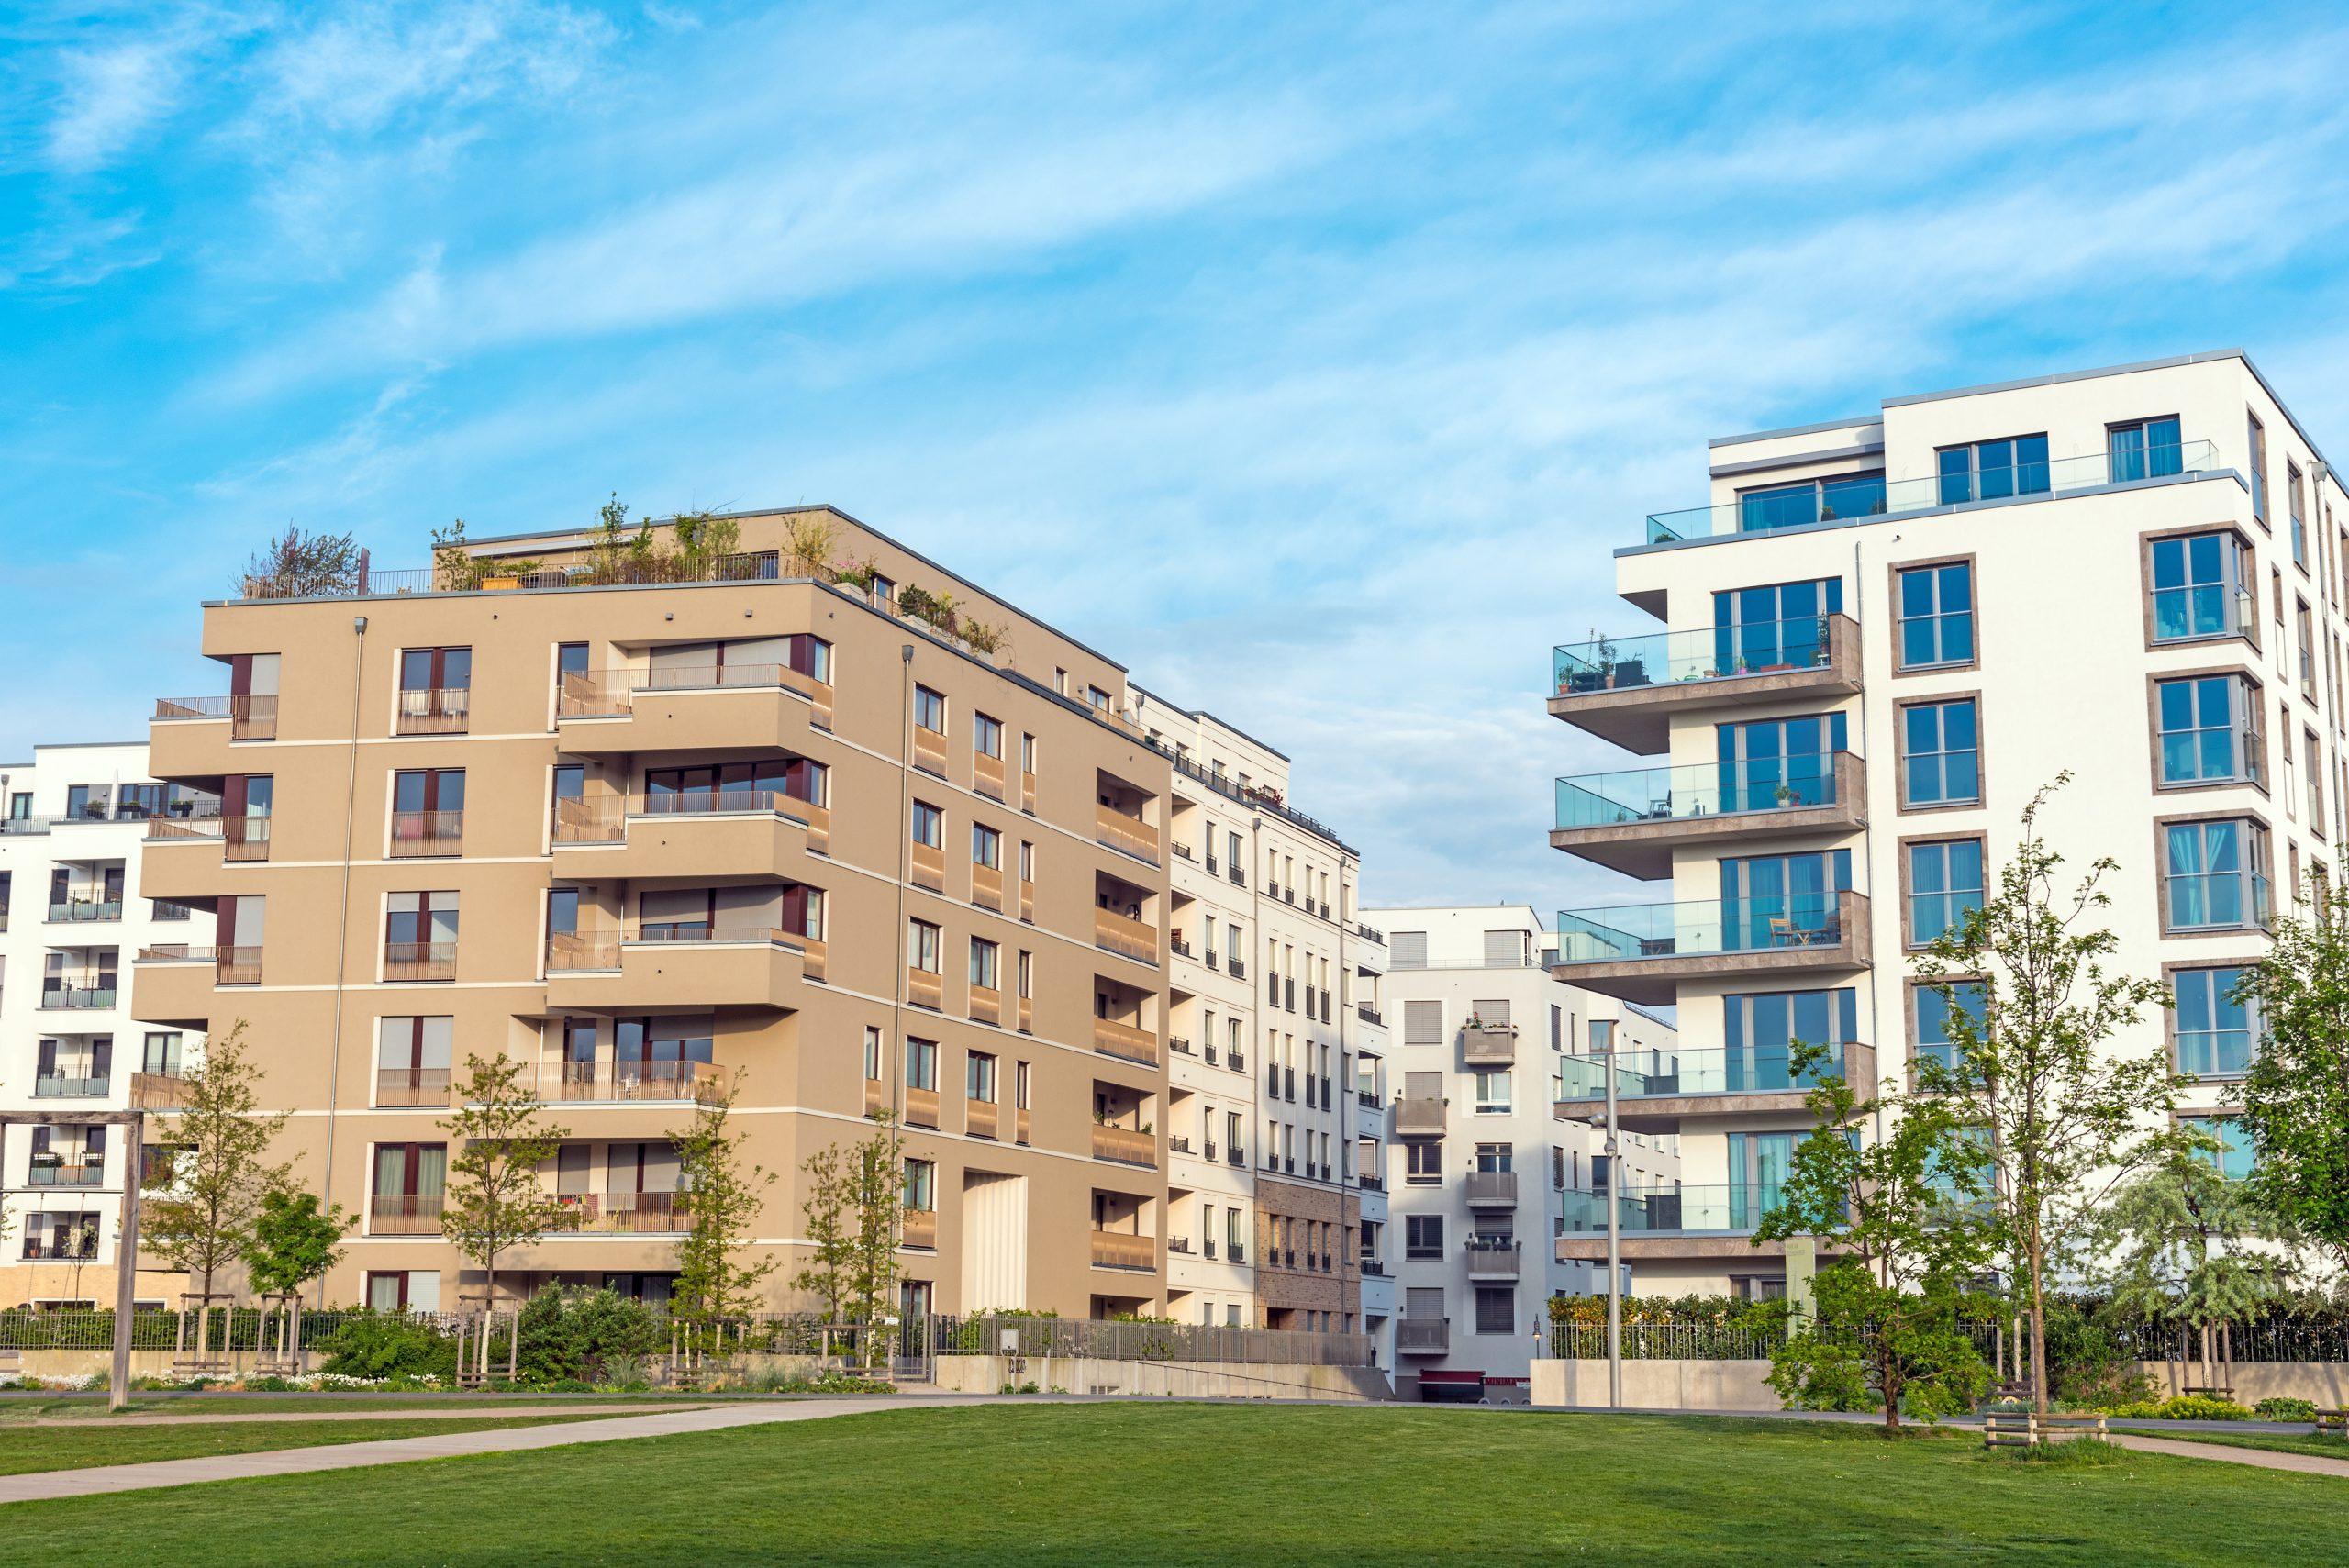 Hire Cleaners Multi Tenant Buildings